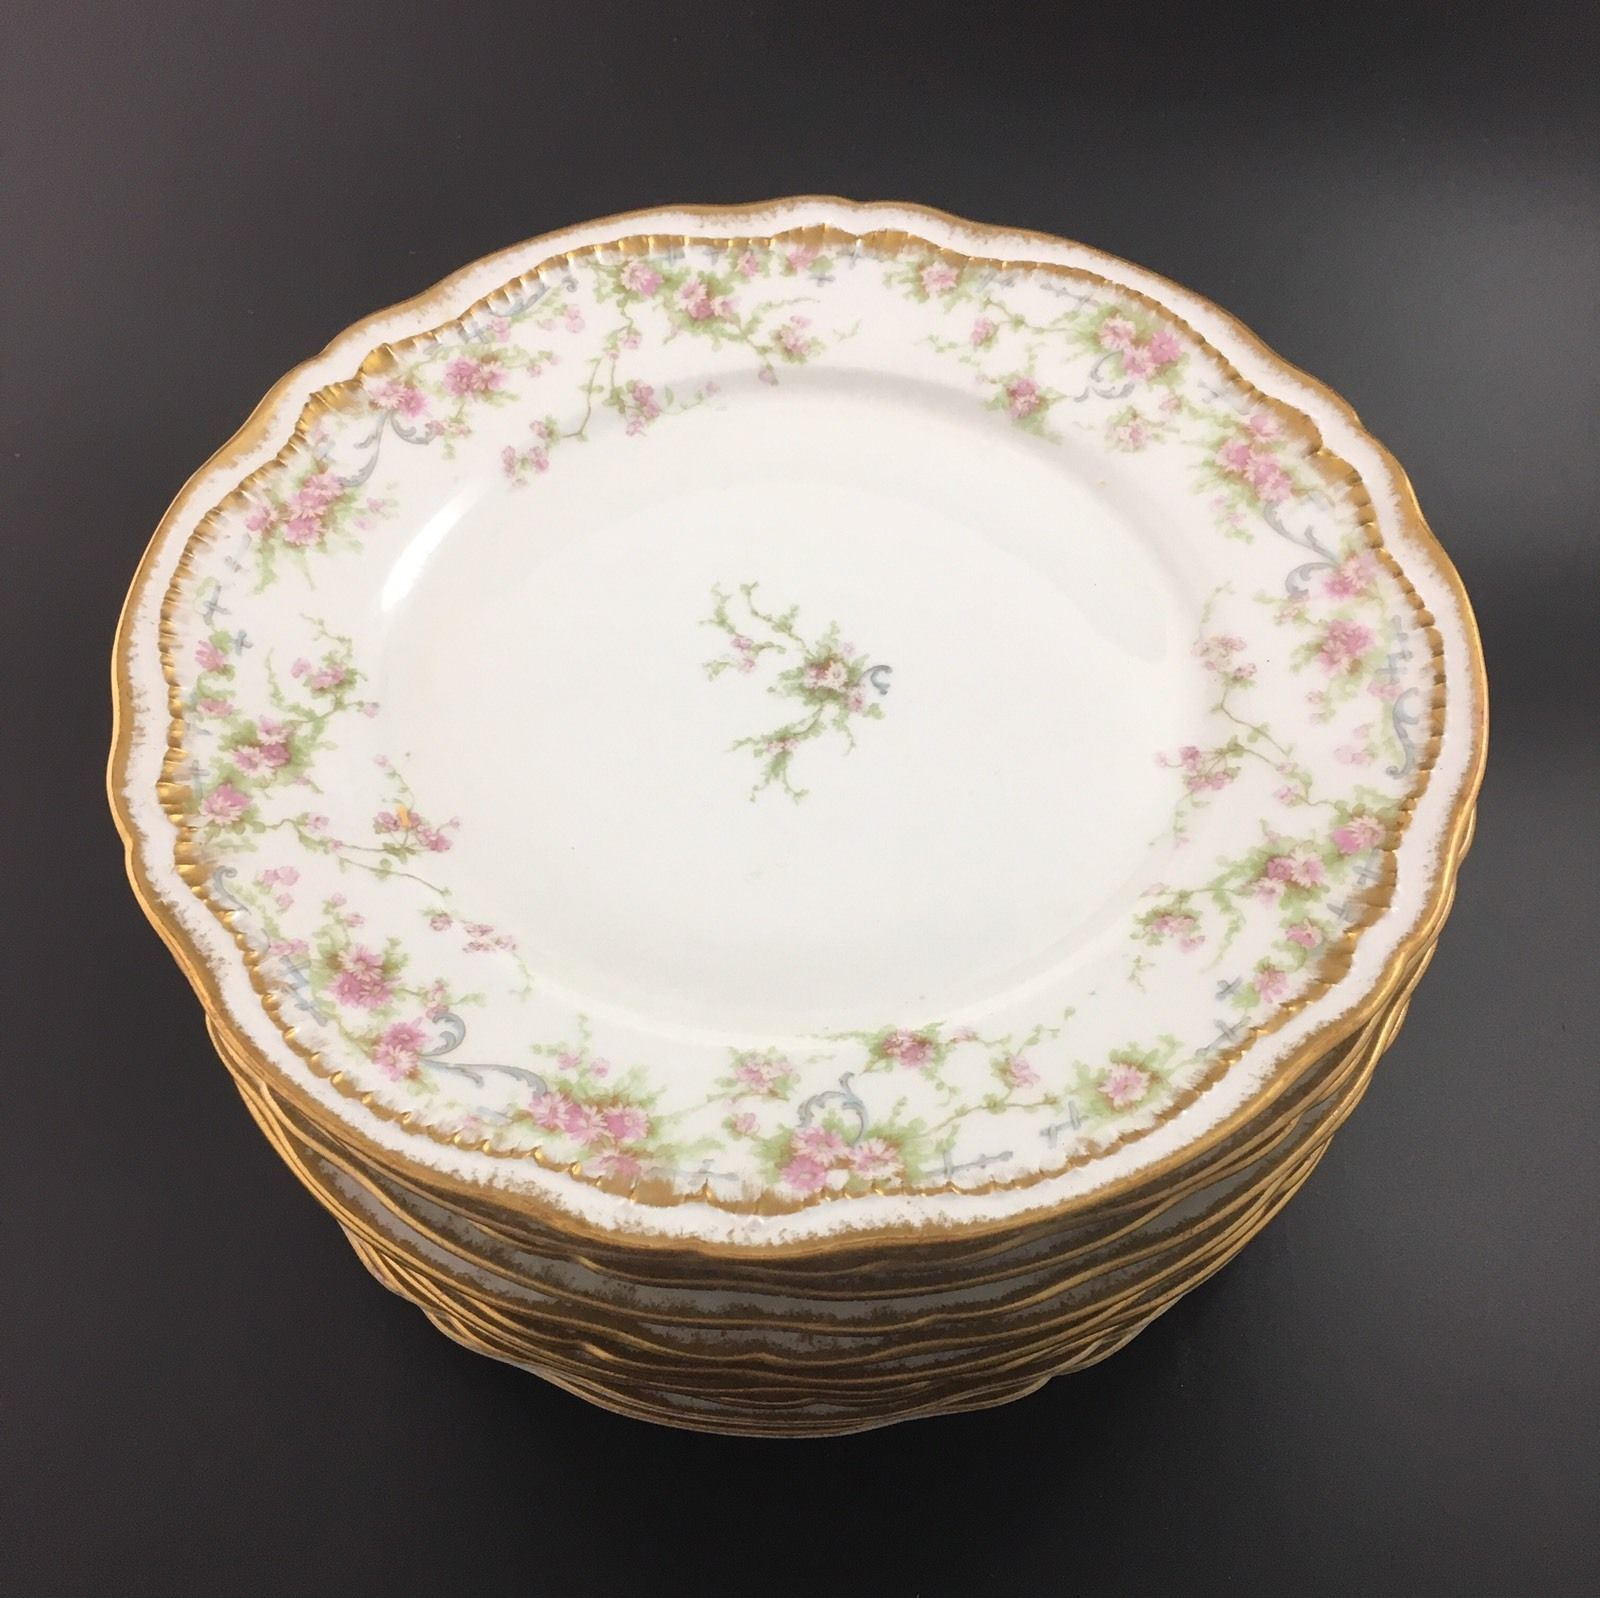 Sch 142A Haviland Limoges Luncheon plate